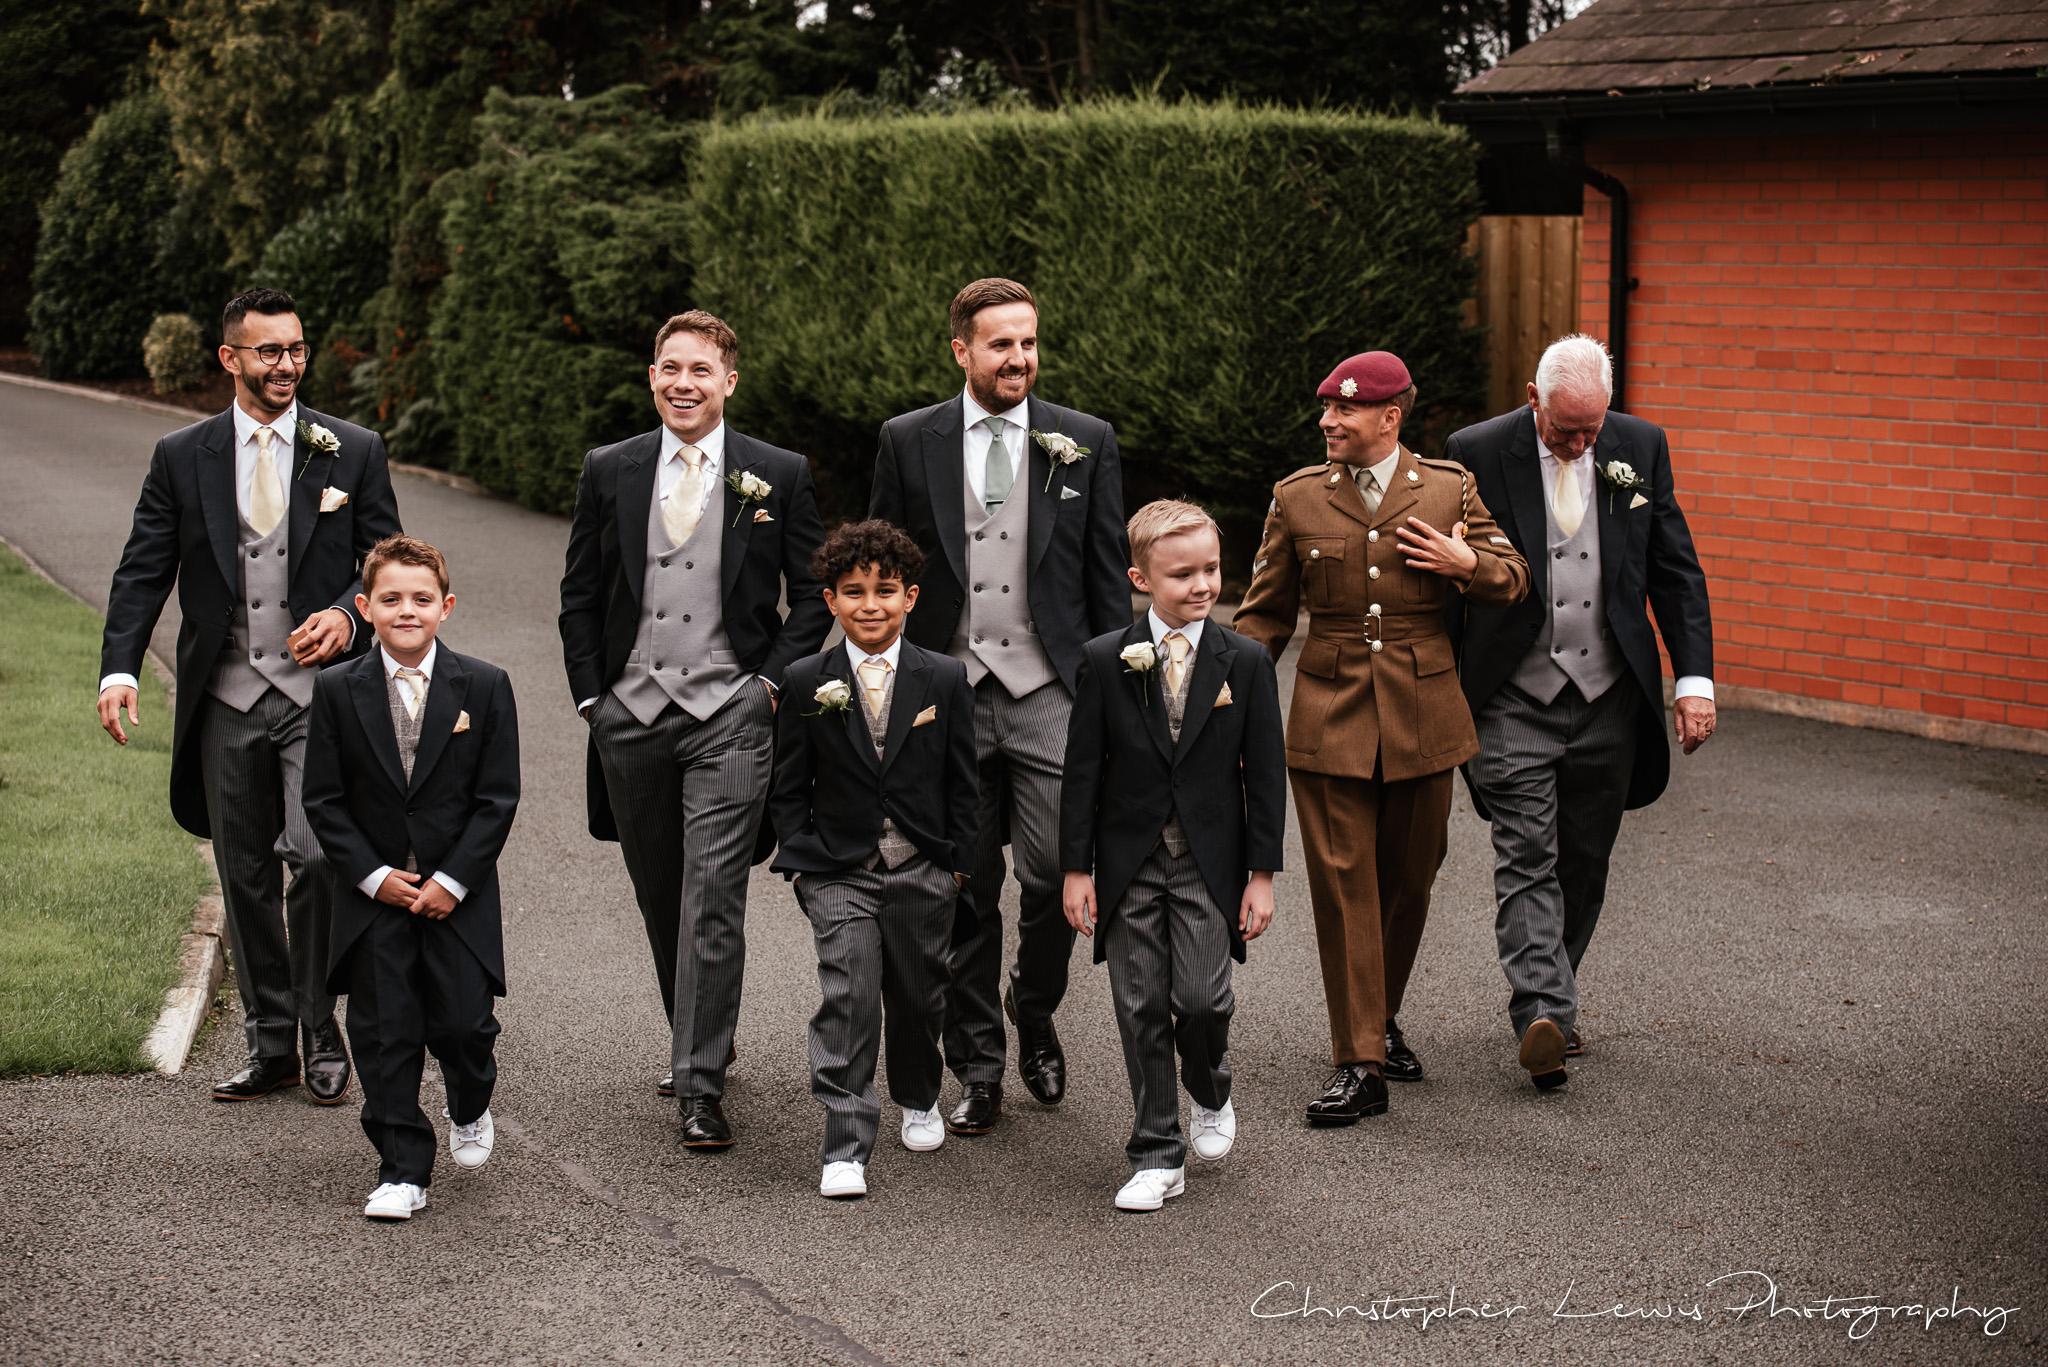 Colshaw Hall Wedding groomsmen